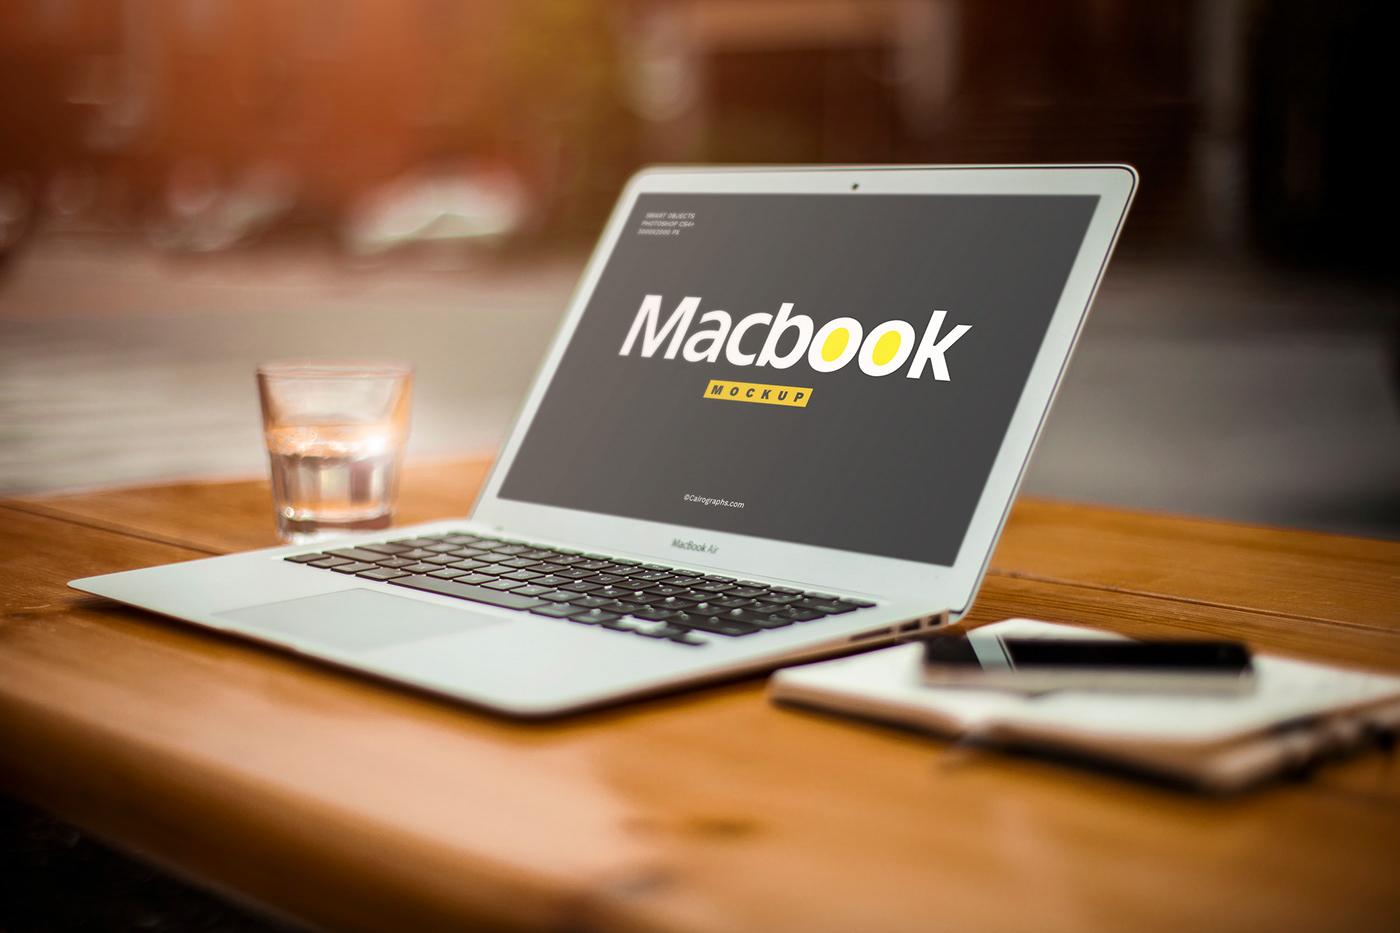 mockups mock-ups apple macbook iphone iPad Sony xperia xperia z2